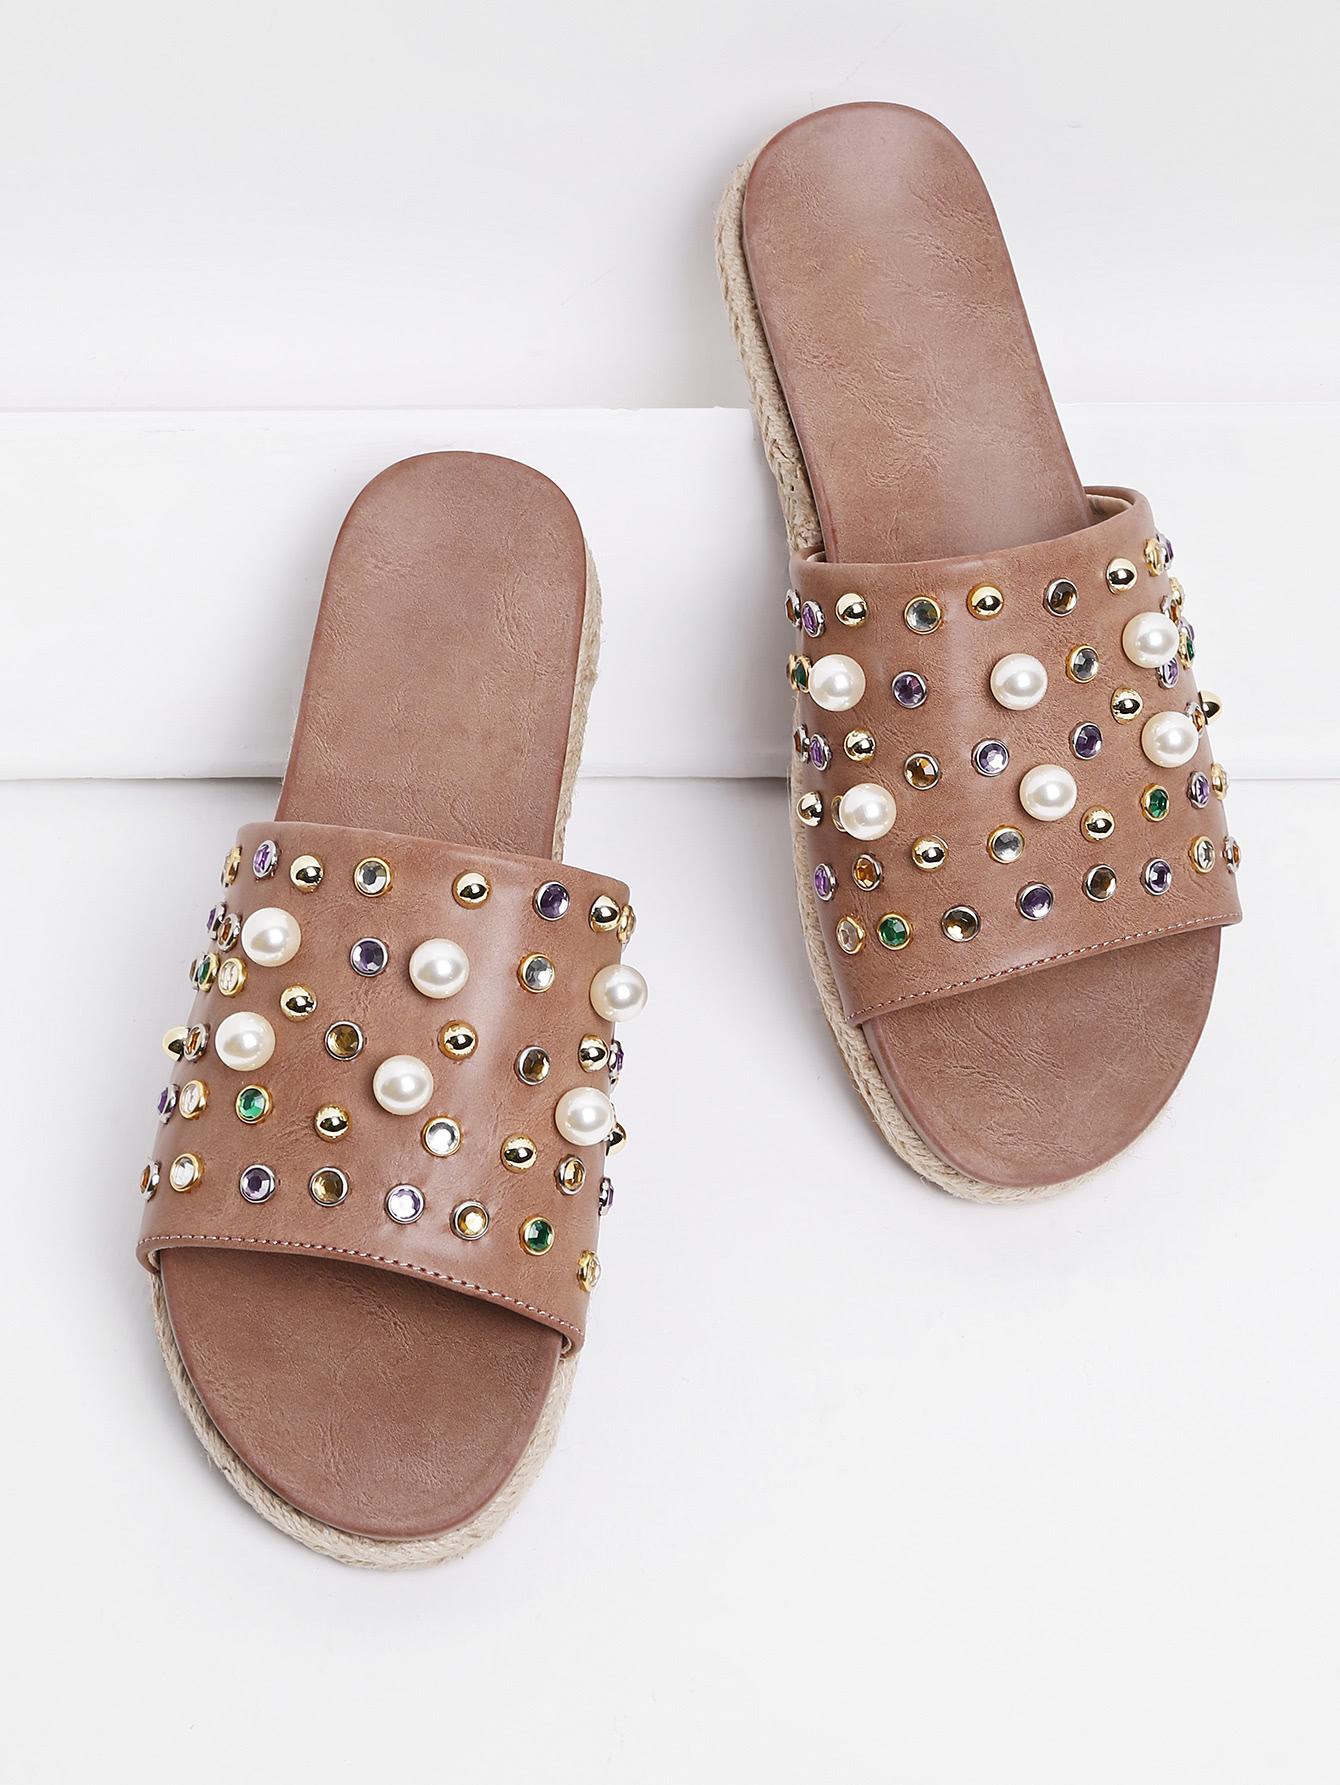 Rhinestone & Faux Pearl Design Flatform Sandals